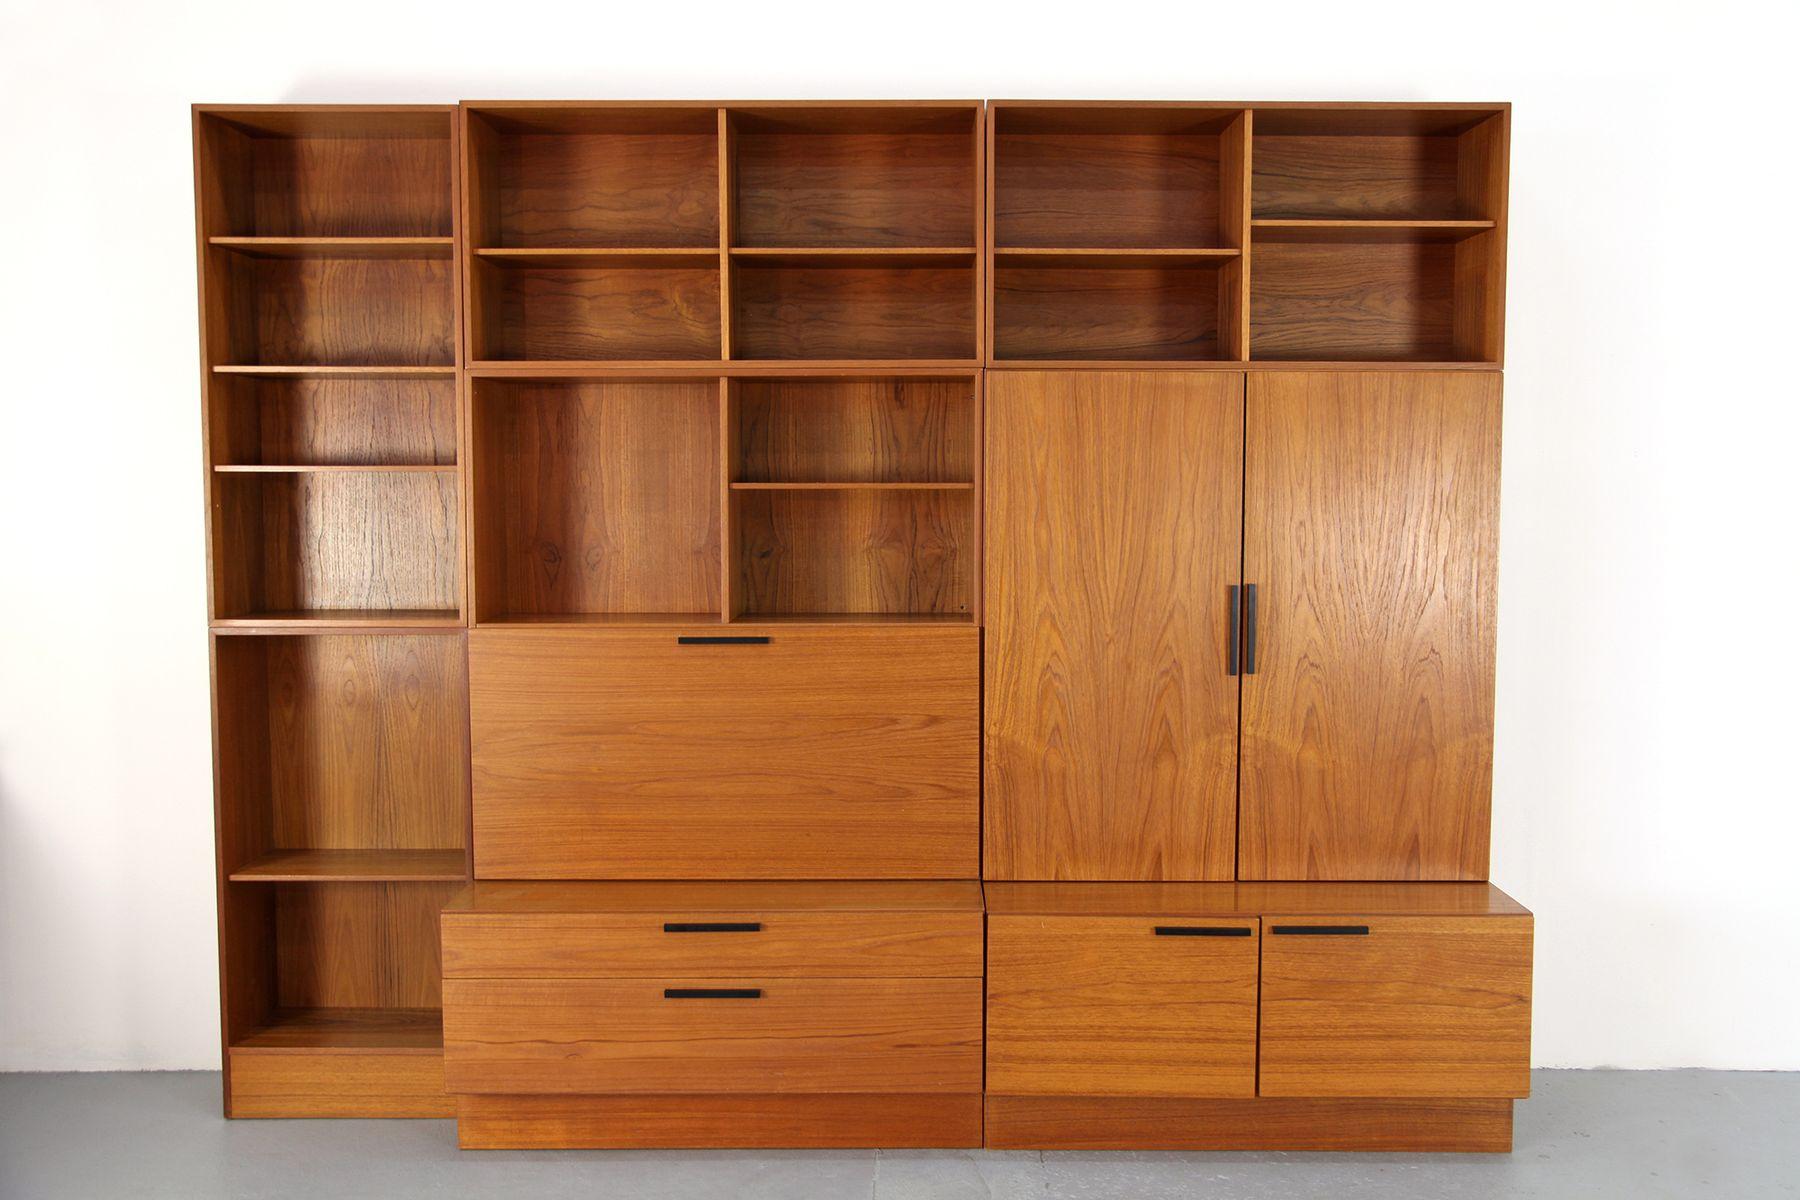 modulares regalsystem von ib kofod larsen f r faarup. Black Bedroom Furniture Sets. Home Design Ideas